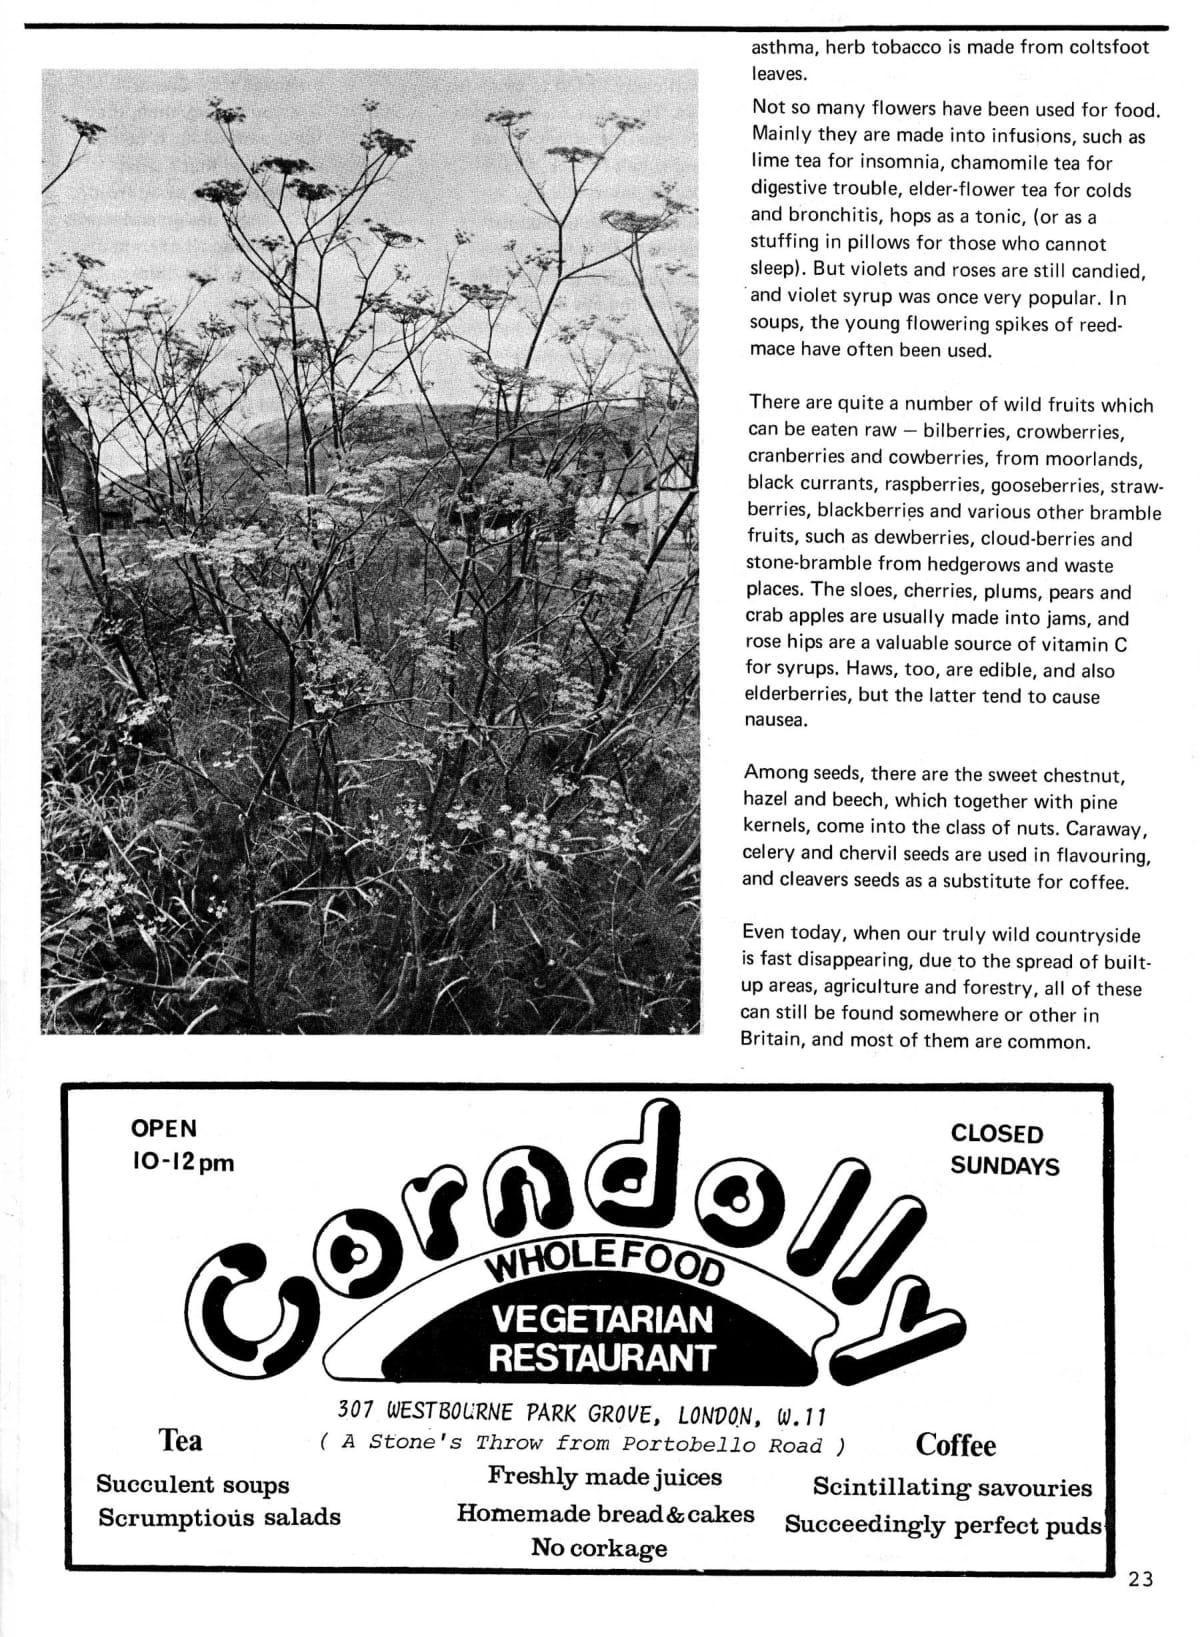 seed-v2-n4-april1973-23.jpg